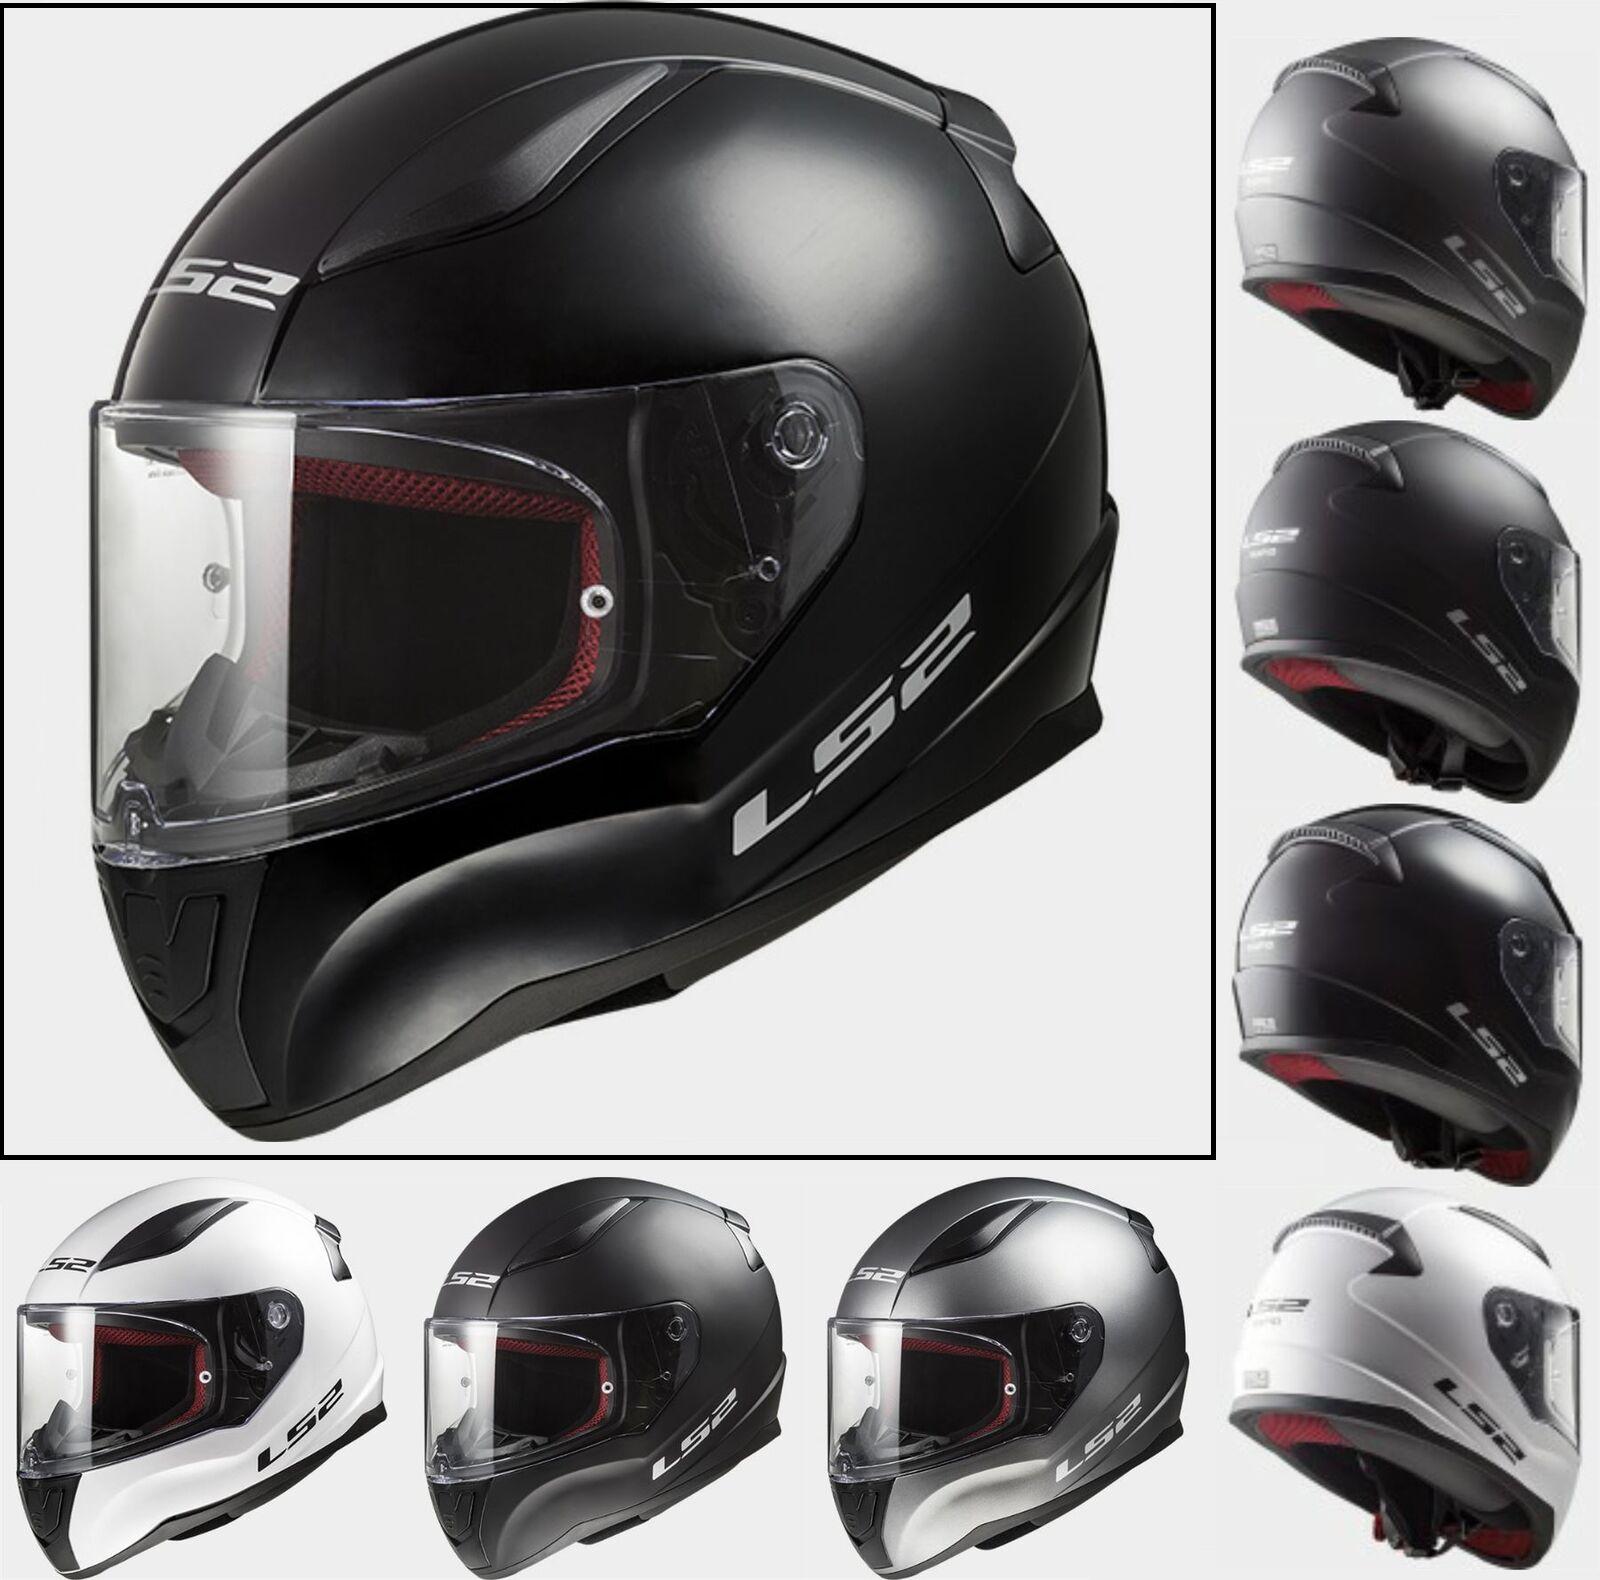 BOX BX-1 FULL FACE ACU GOLD STANDARD MOTORCYCLE HELMET BLACK//WHITE//SILVER S//M//L